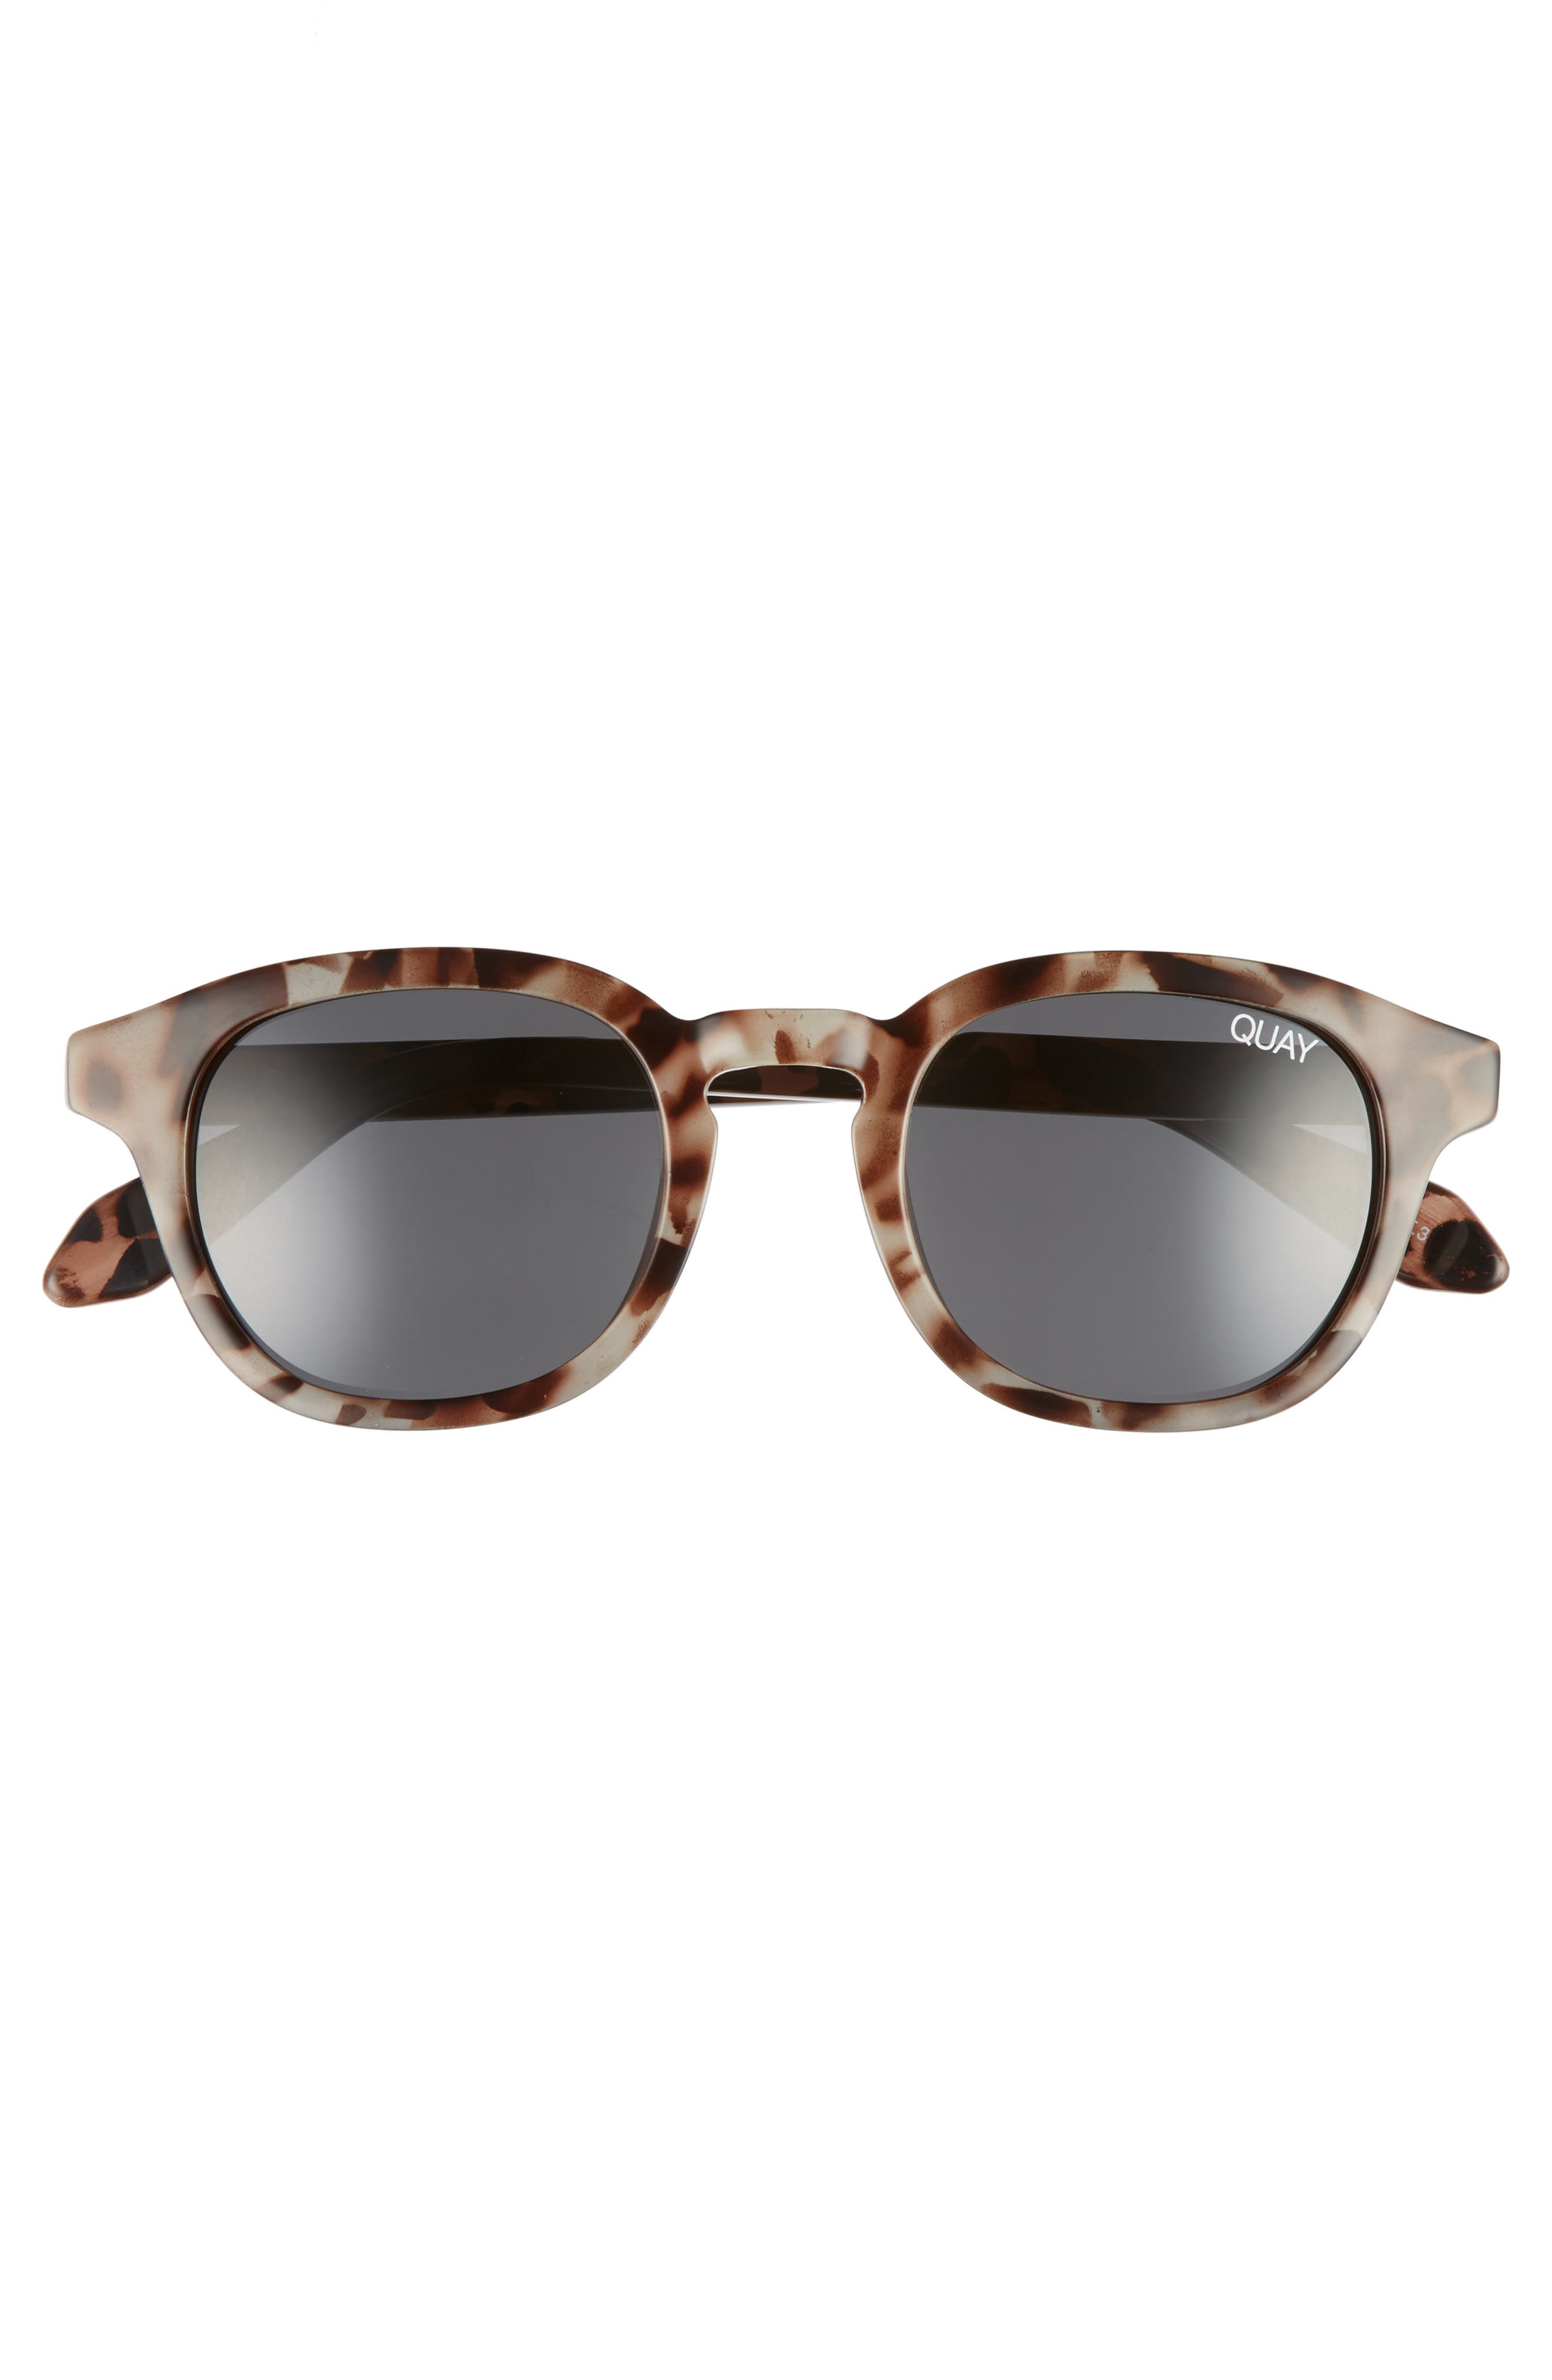 Walk On 47mm Polarized Sunglasses,                             Alternate thumbnail 2, color,                             Tortoise / Smoke Lens